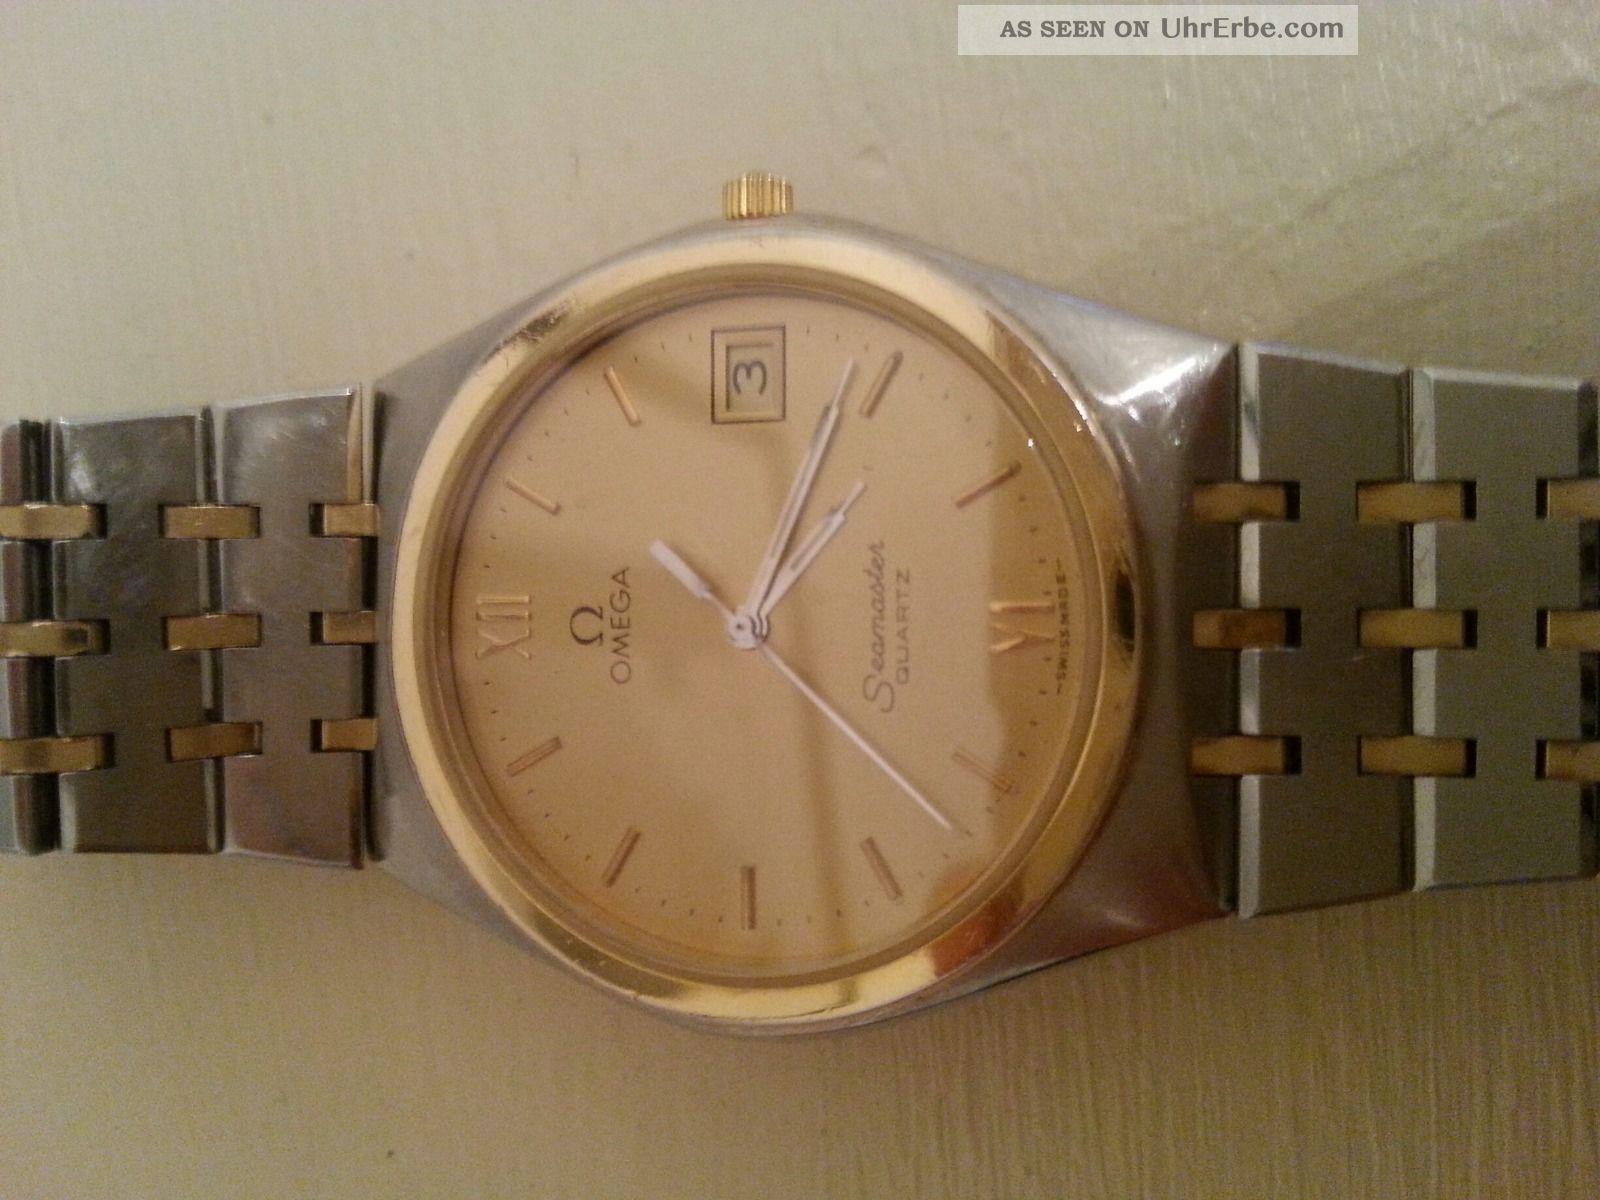 Omega Seamaster Quartz Herrenuhr Bicolor Stahl / Gold Schöner,  Läuft Gut Armbanduhren Bild